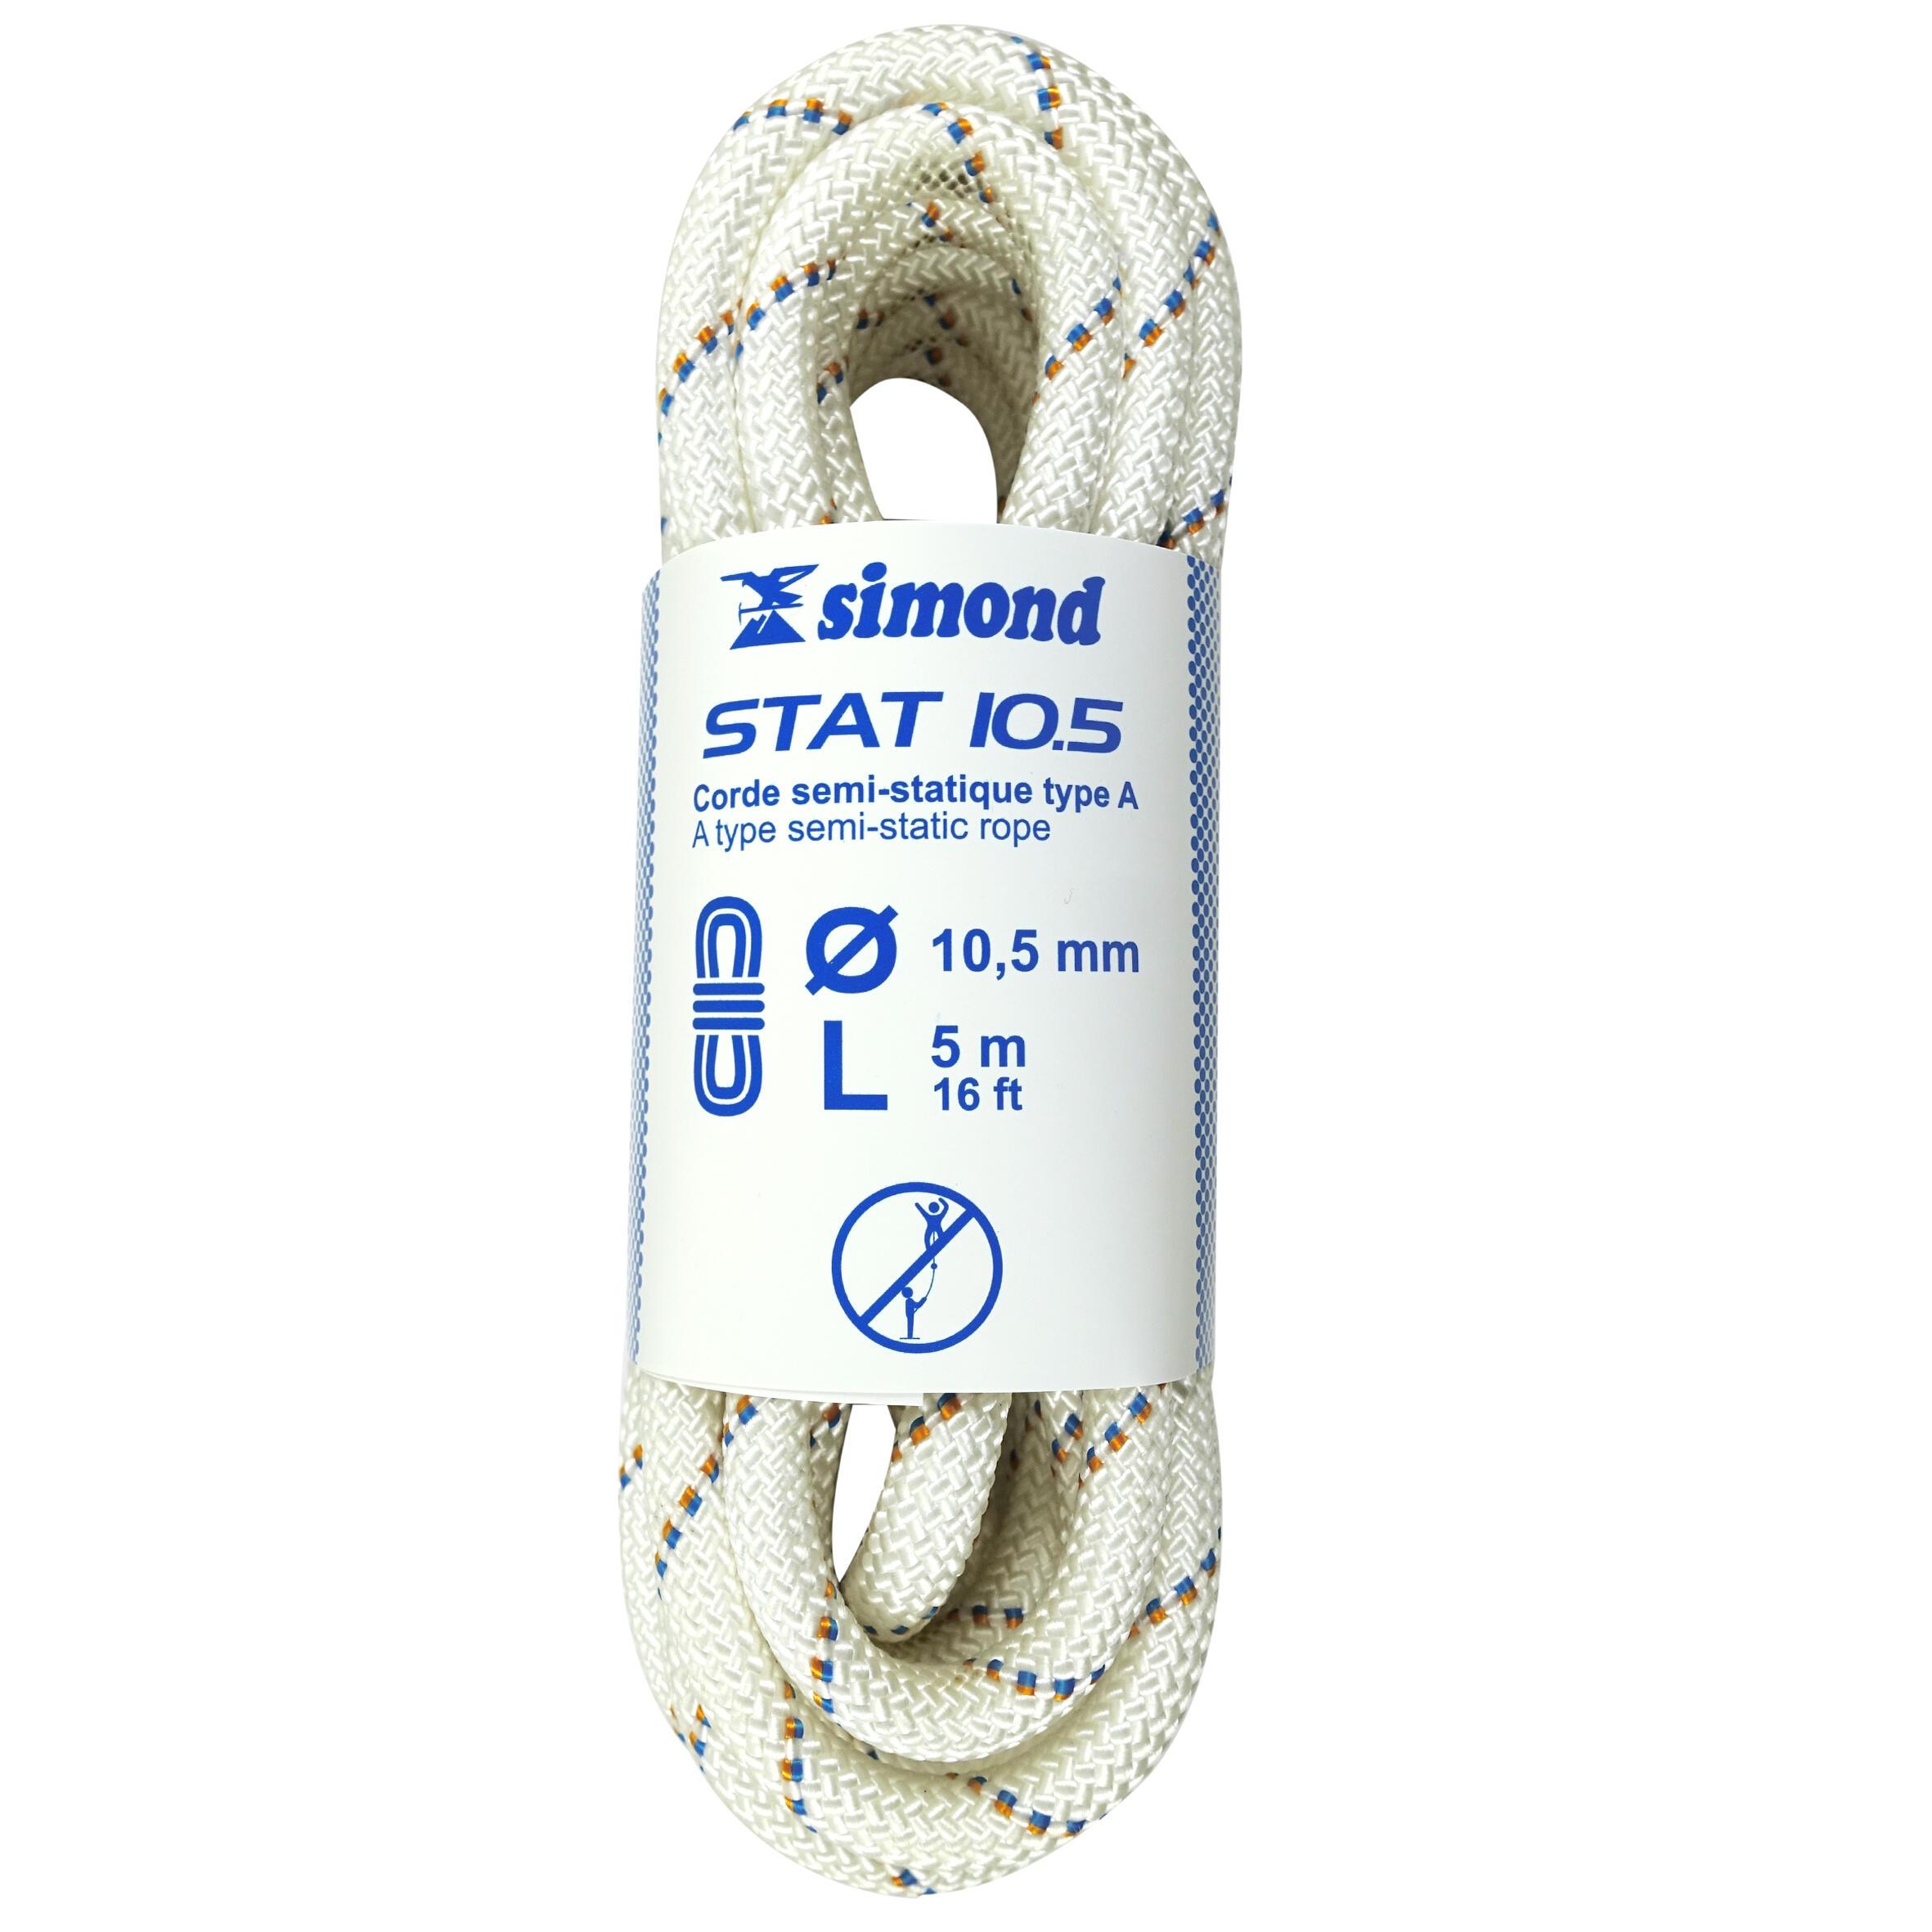 Corde semi-statique STAT 10,5 mm x 5 m